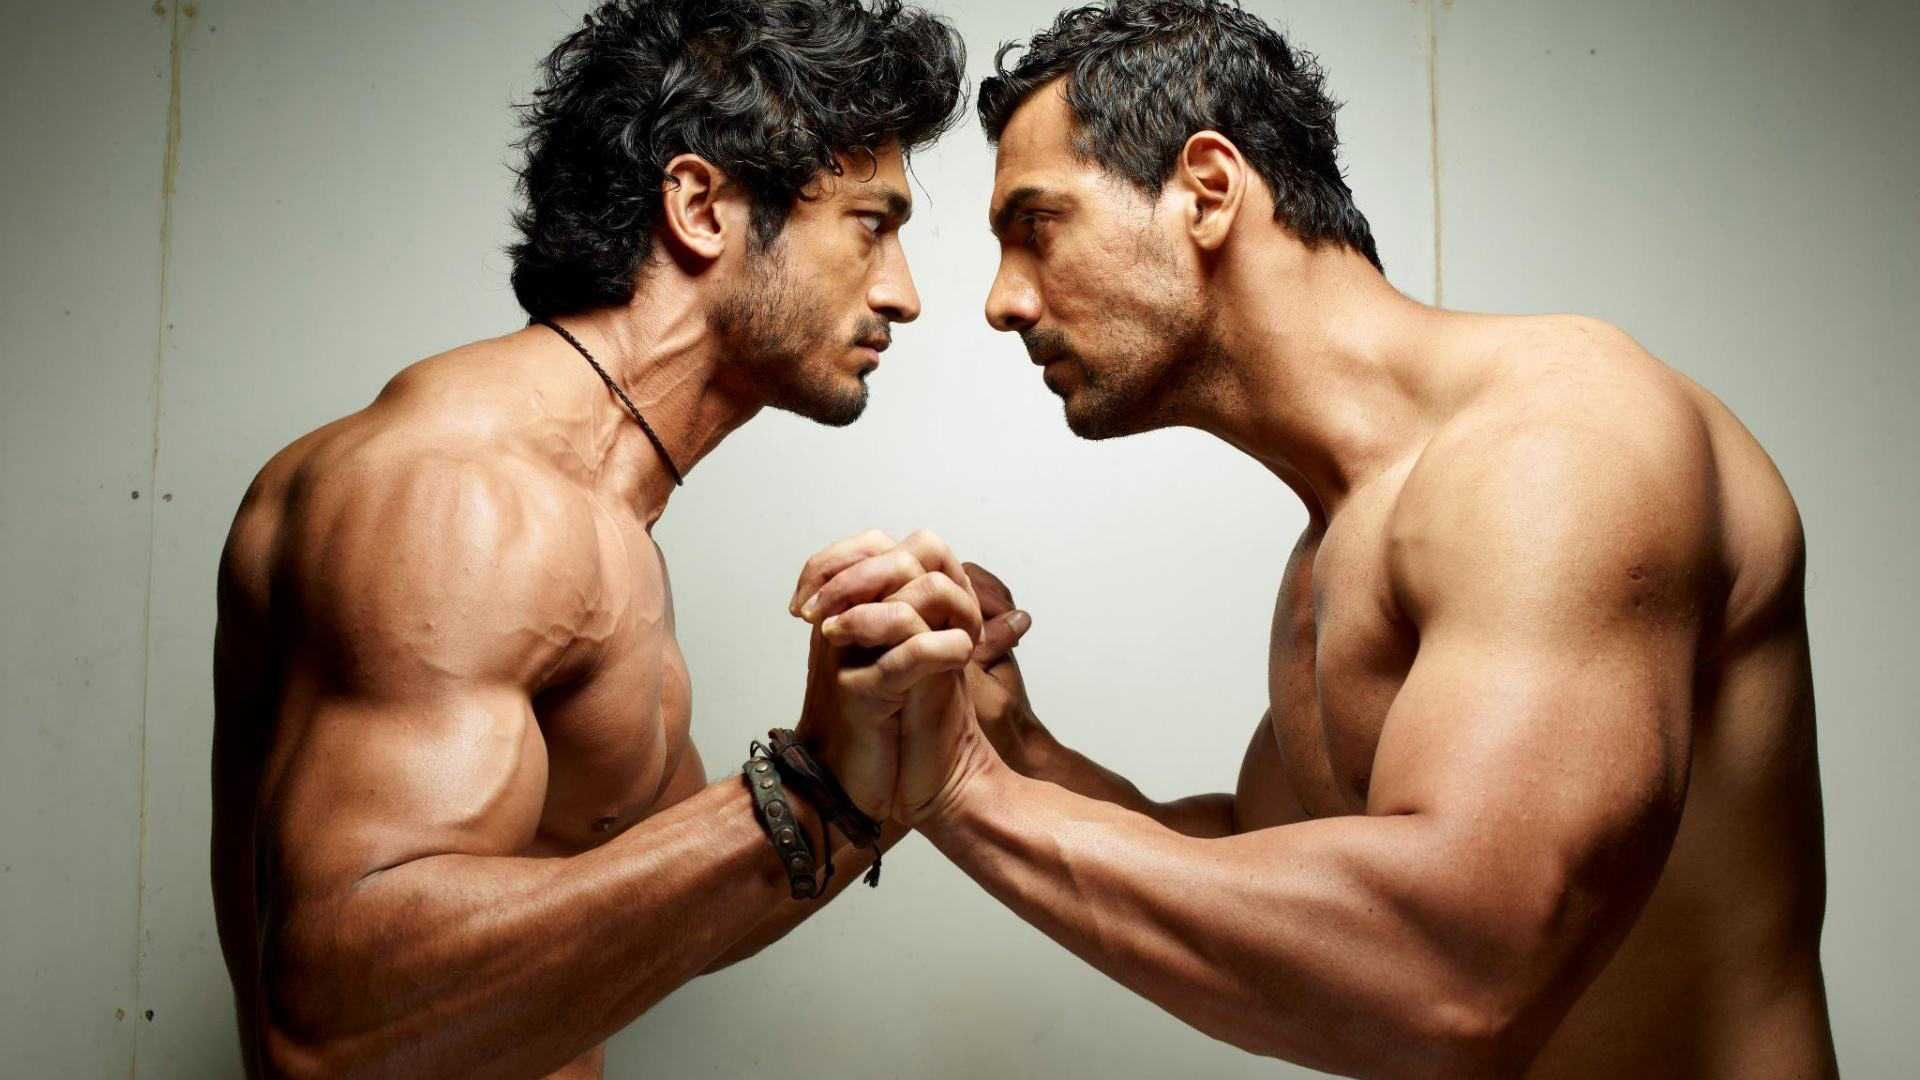 10 Bicep Workouts for Men - Bicep Exercises You Need to Know   GQ India    John abraham body, Vidyut jamwal body, Vidyut jamwal